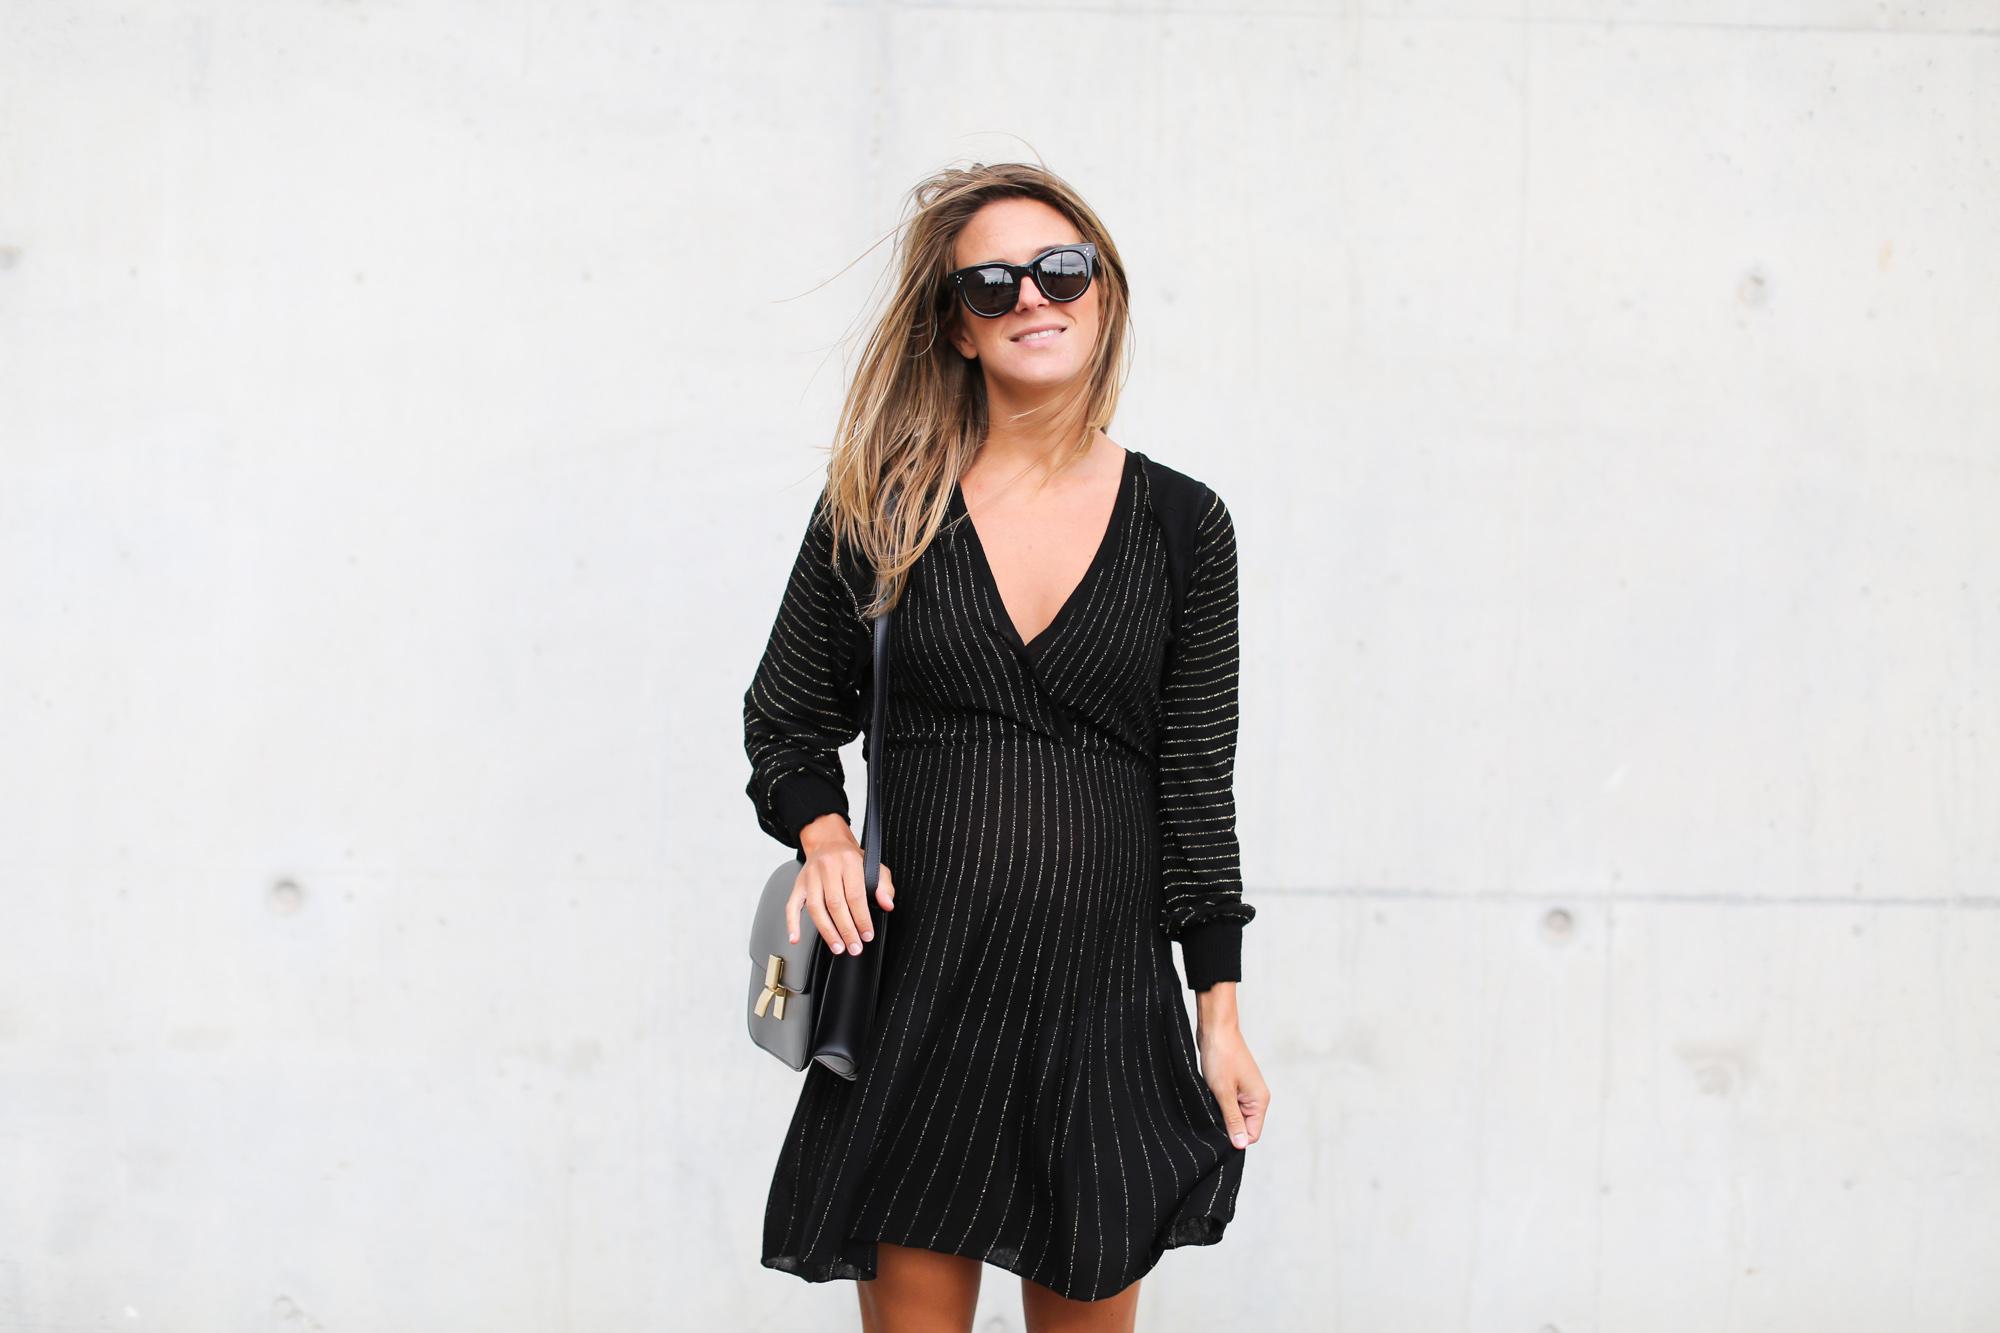 Clochet_streetstyle_fashionblogger_zaraknitdress_specialedition_celineboxbag_celinesunglasses-3